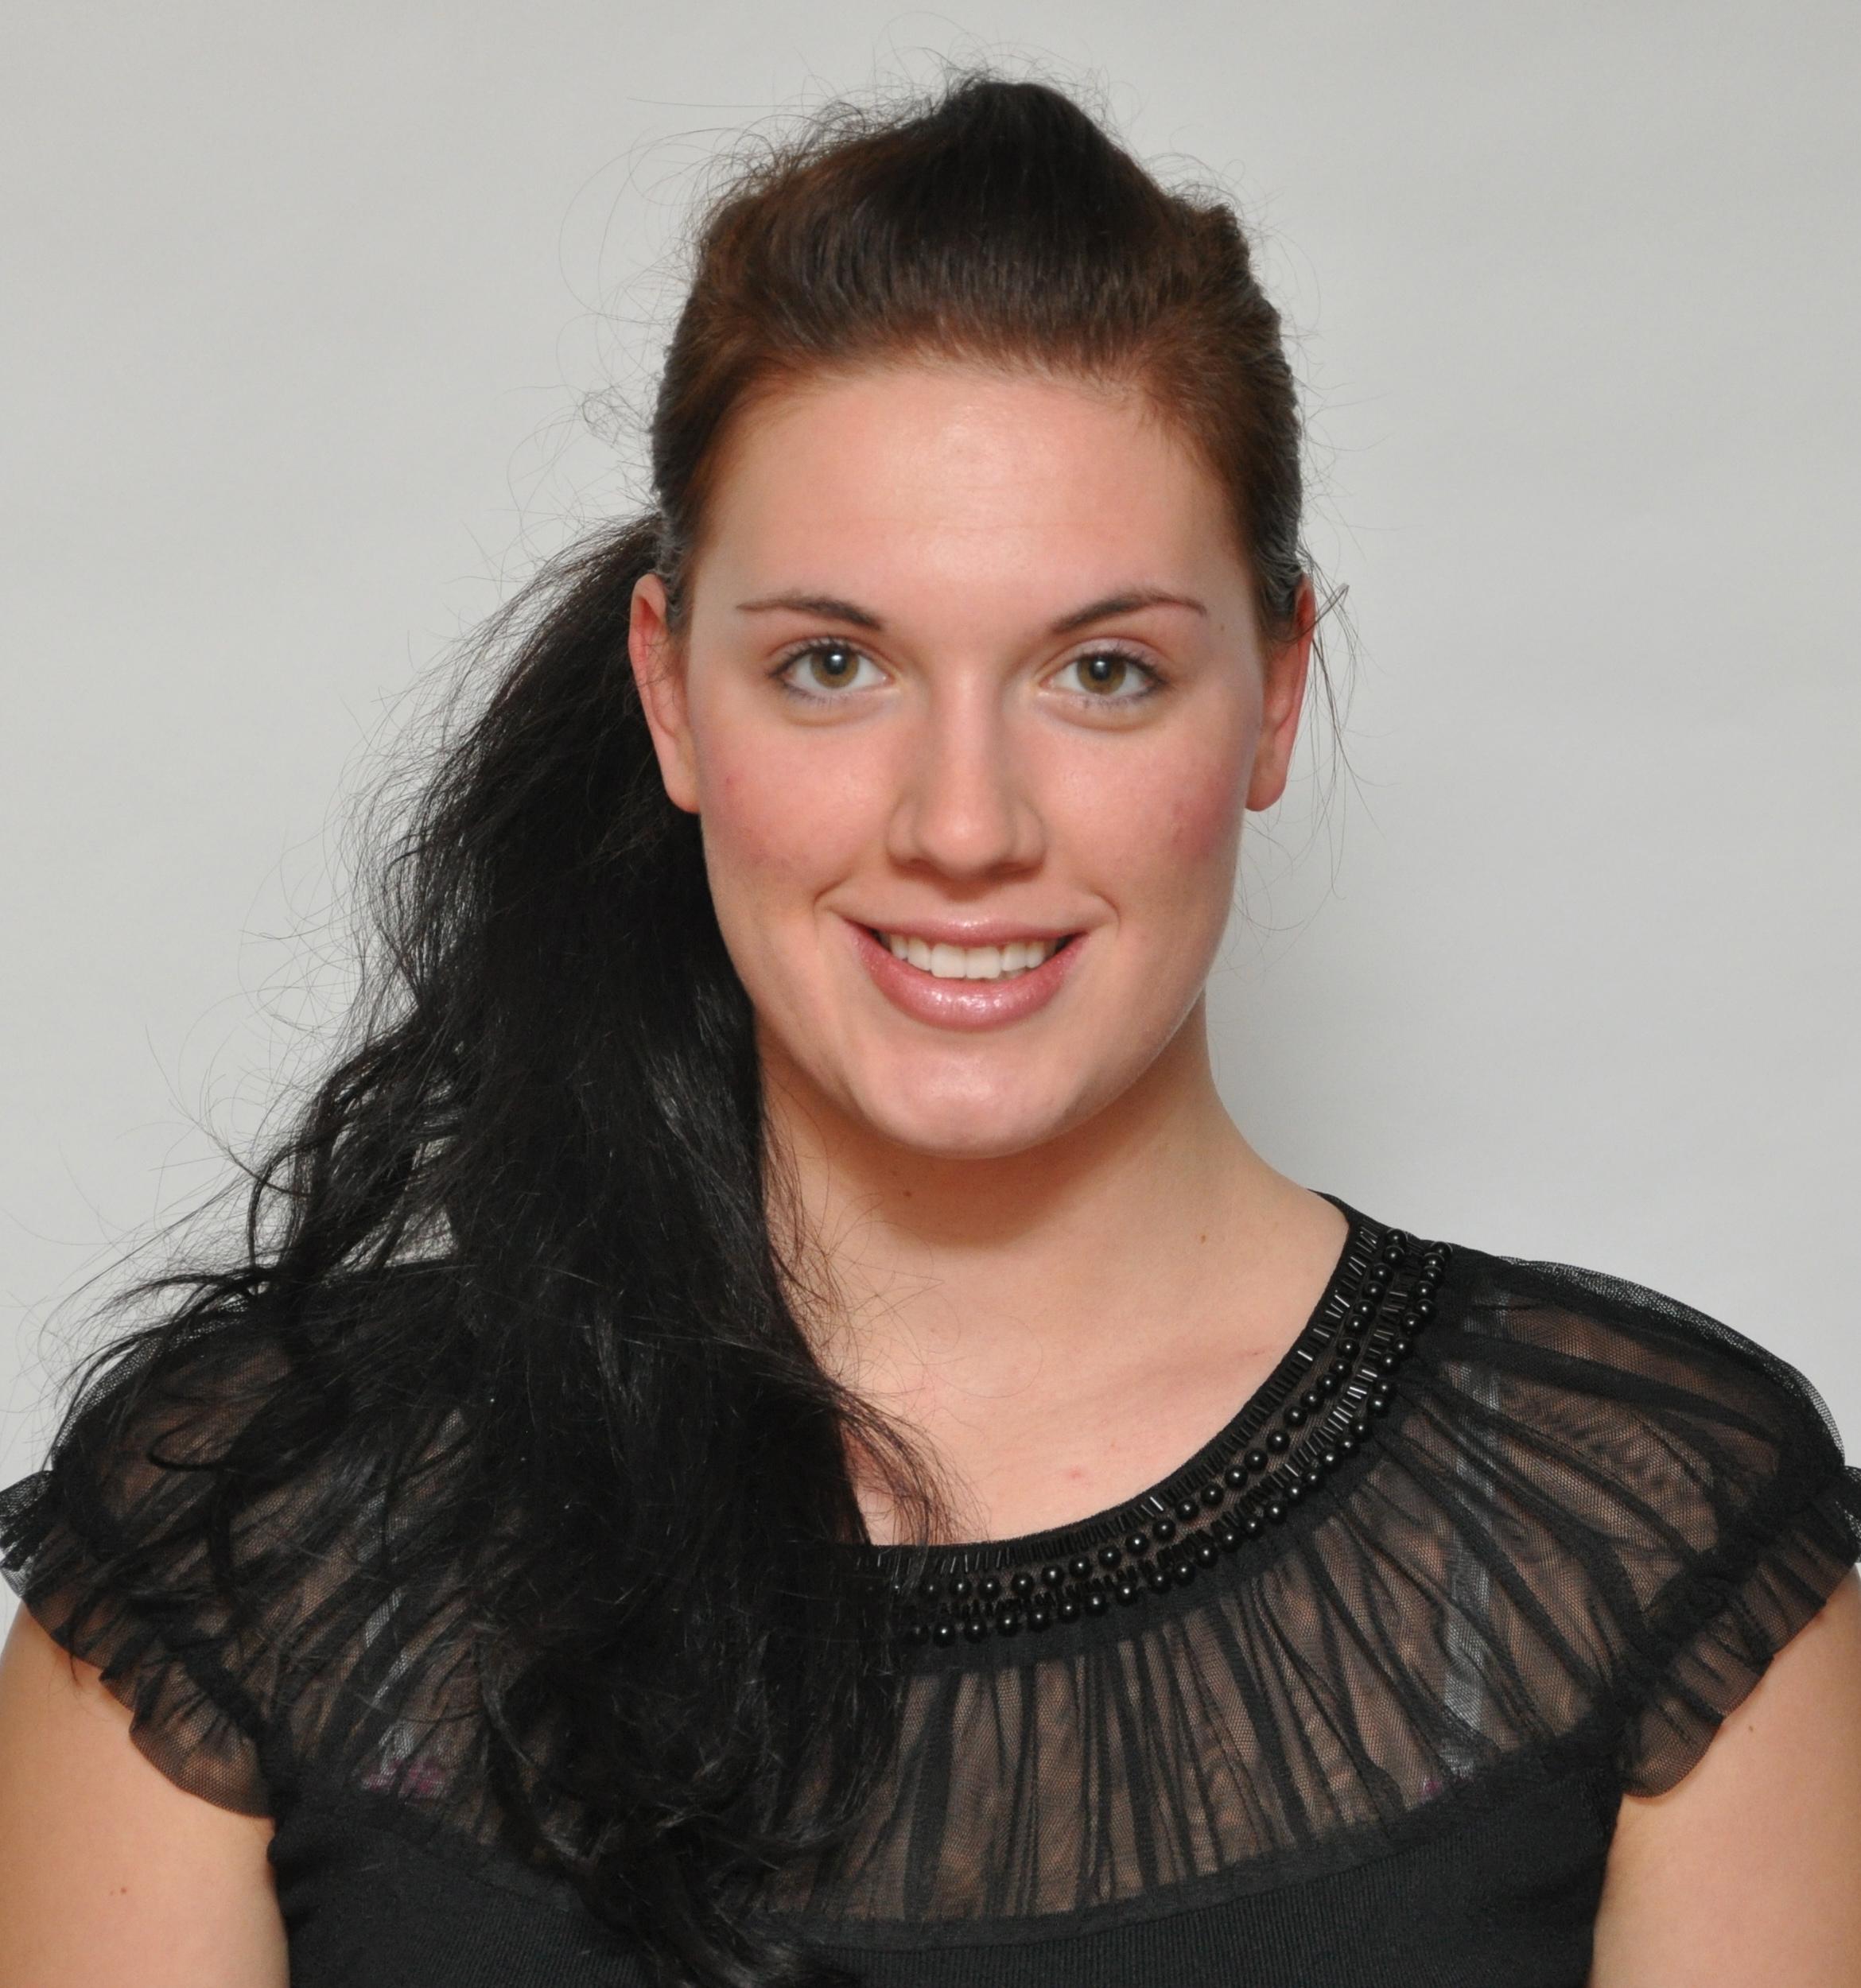 Tereza Slavova, Bachelor of Arts (Honours) in International Business (WD134)